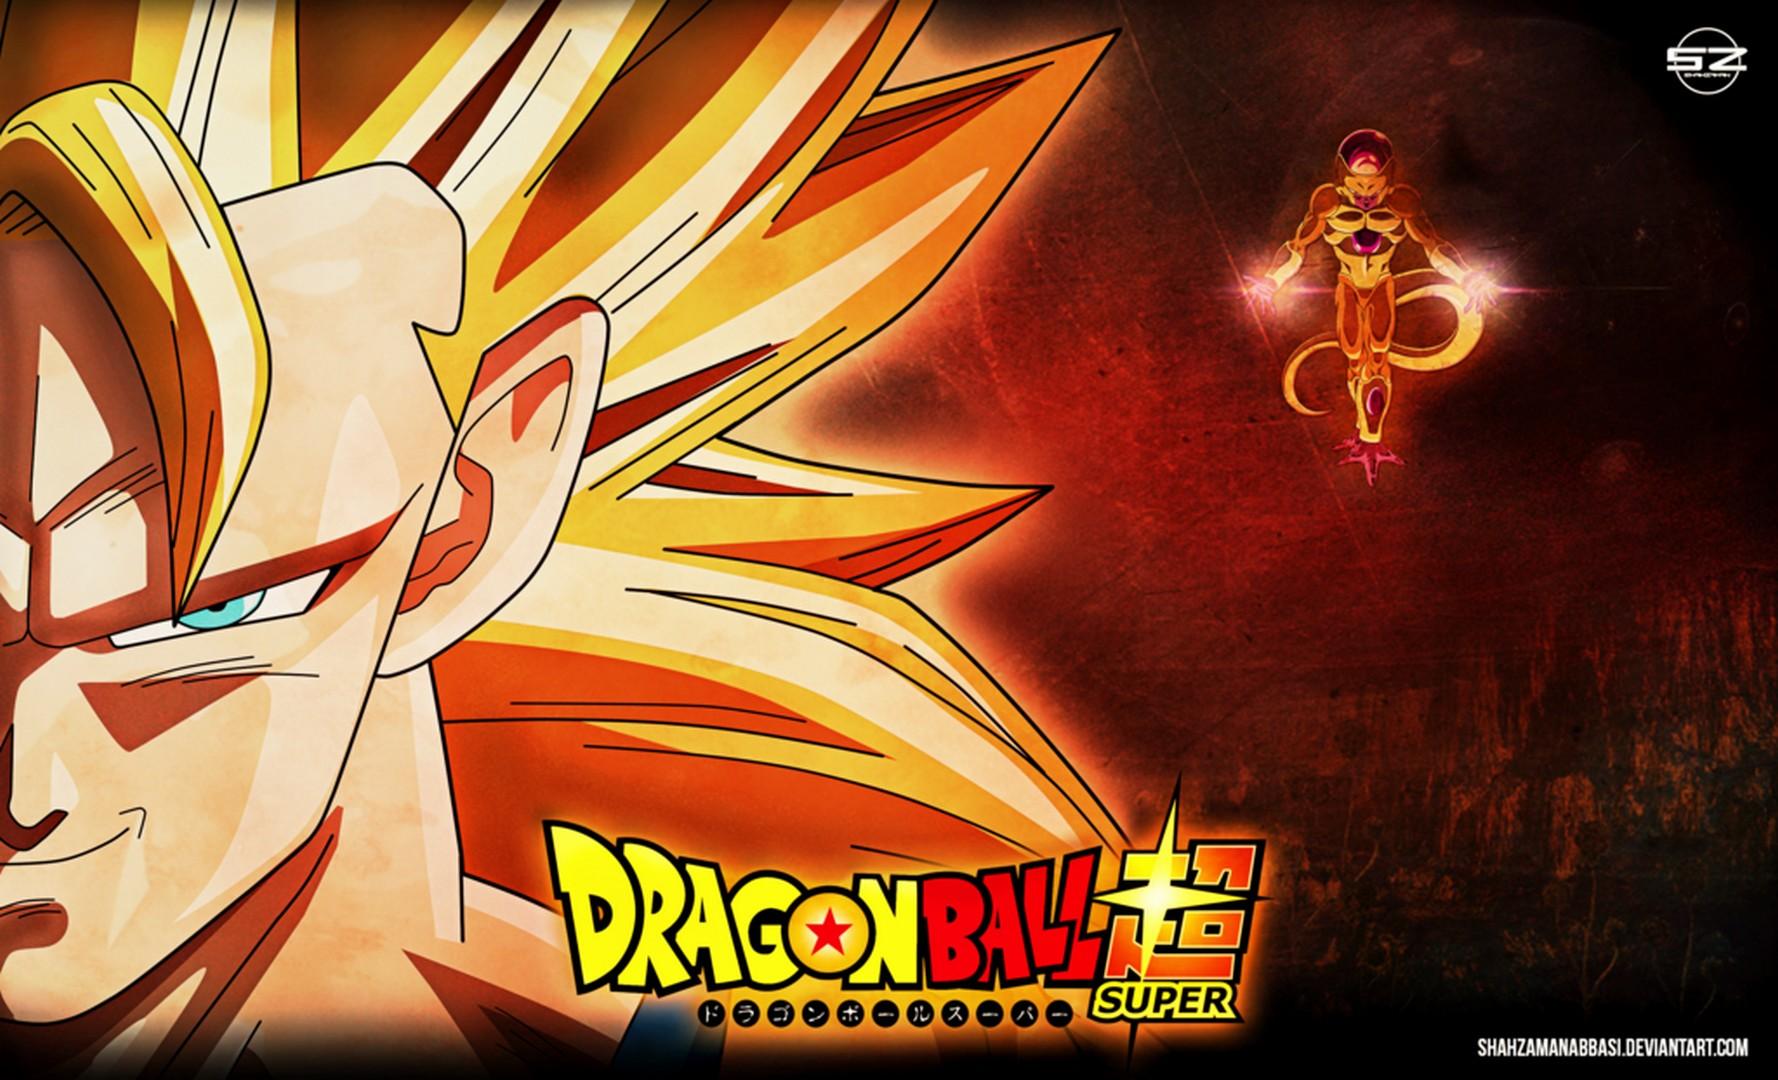 Dragon Ball Live Wallpaper Iphone X Dragon Ball Super Wallpaper Episode 2019 Live Wallpaper Hd